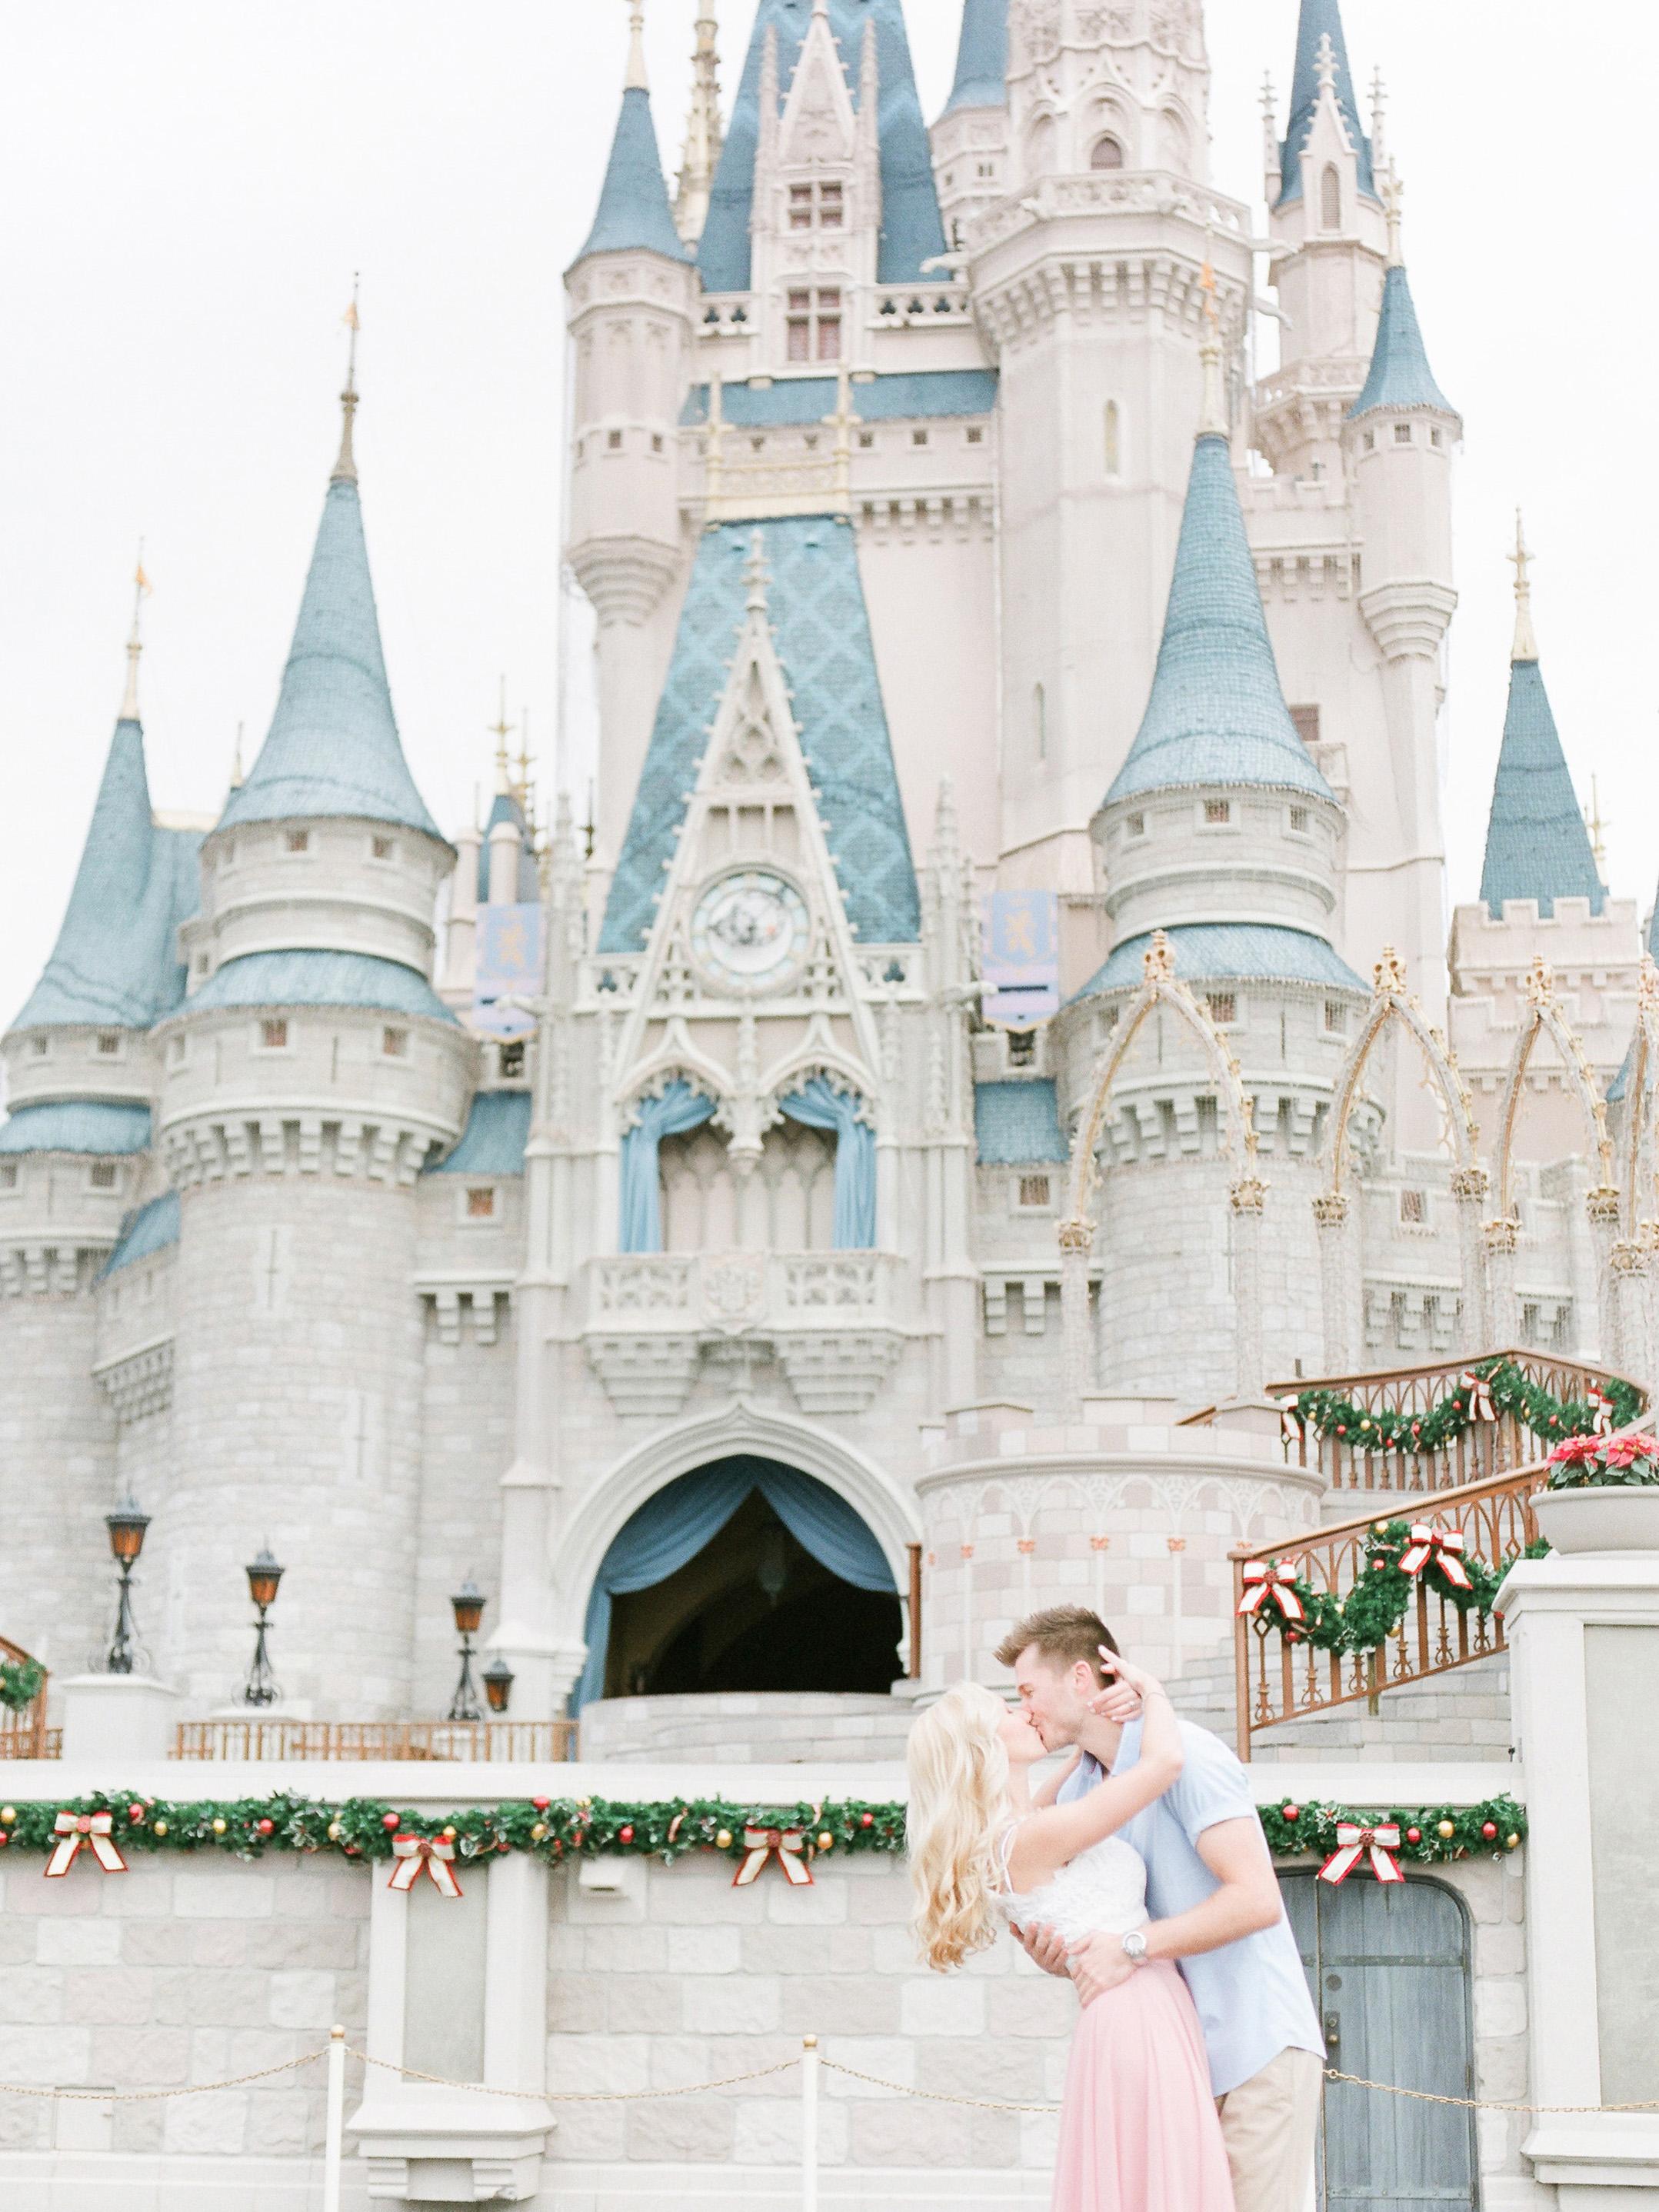 Disney-World-Engagement-Photos_CassiClaire.jpg